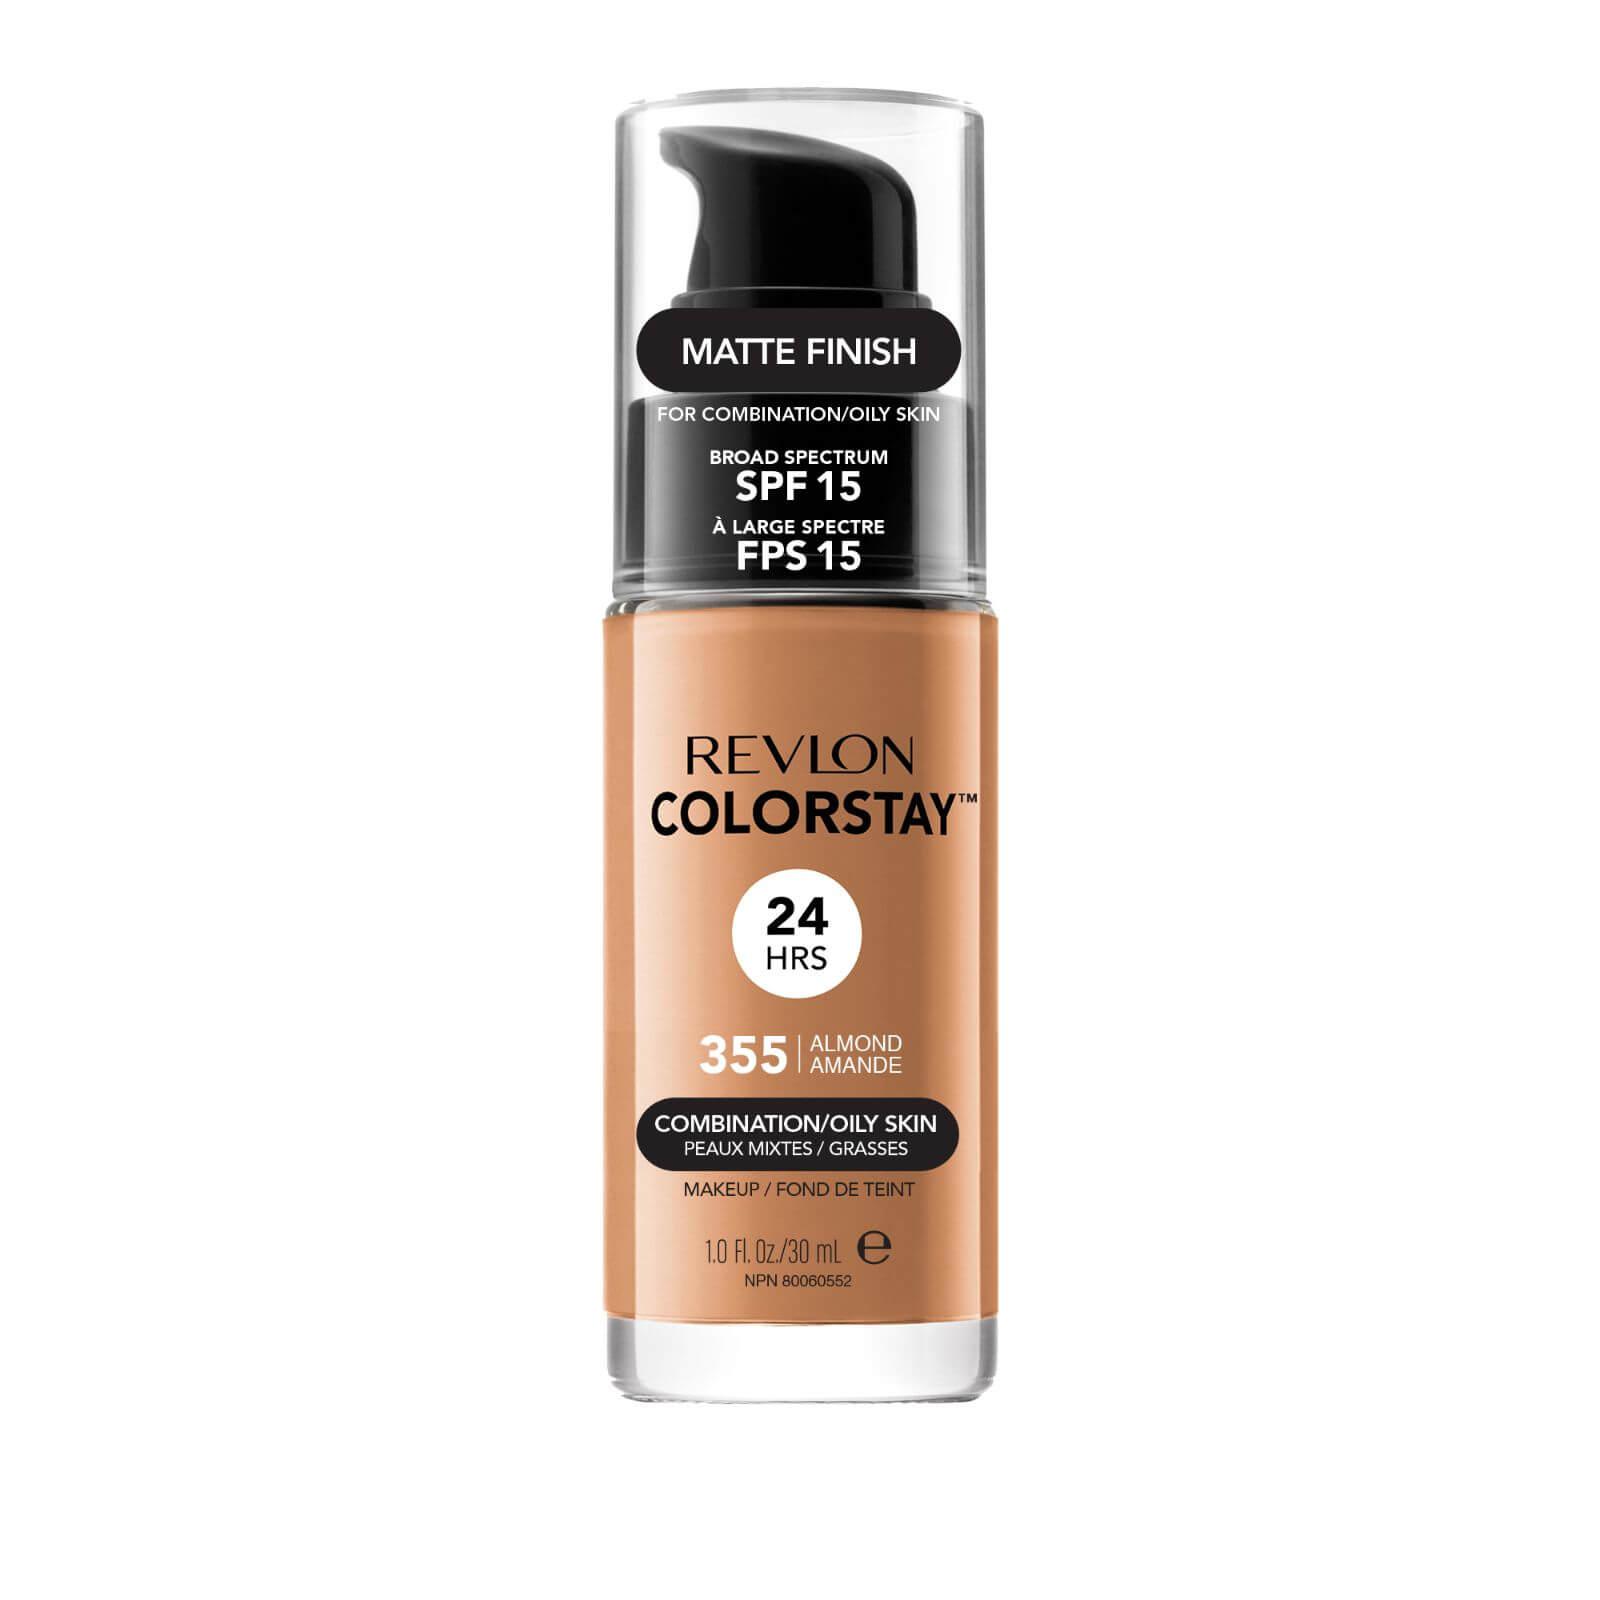 Купить Revlon ColorStay Make-Up Foundation for Combination/Oily Skin (Various Shades) - Almond